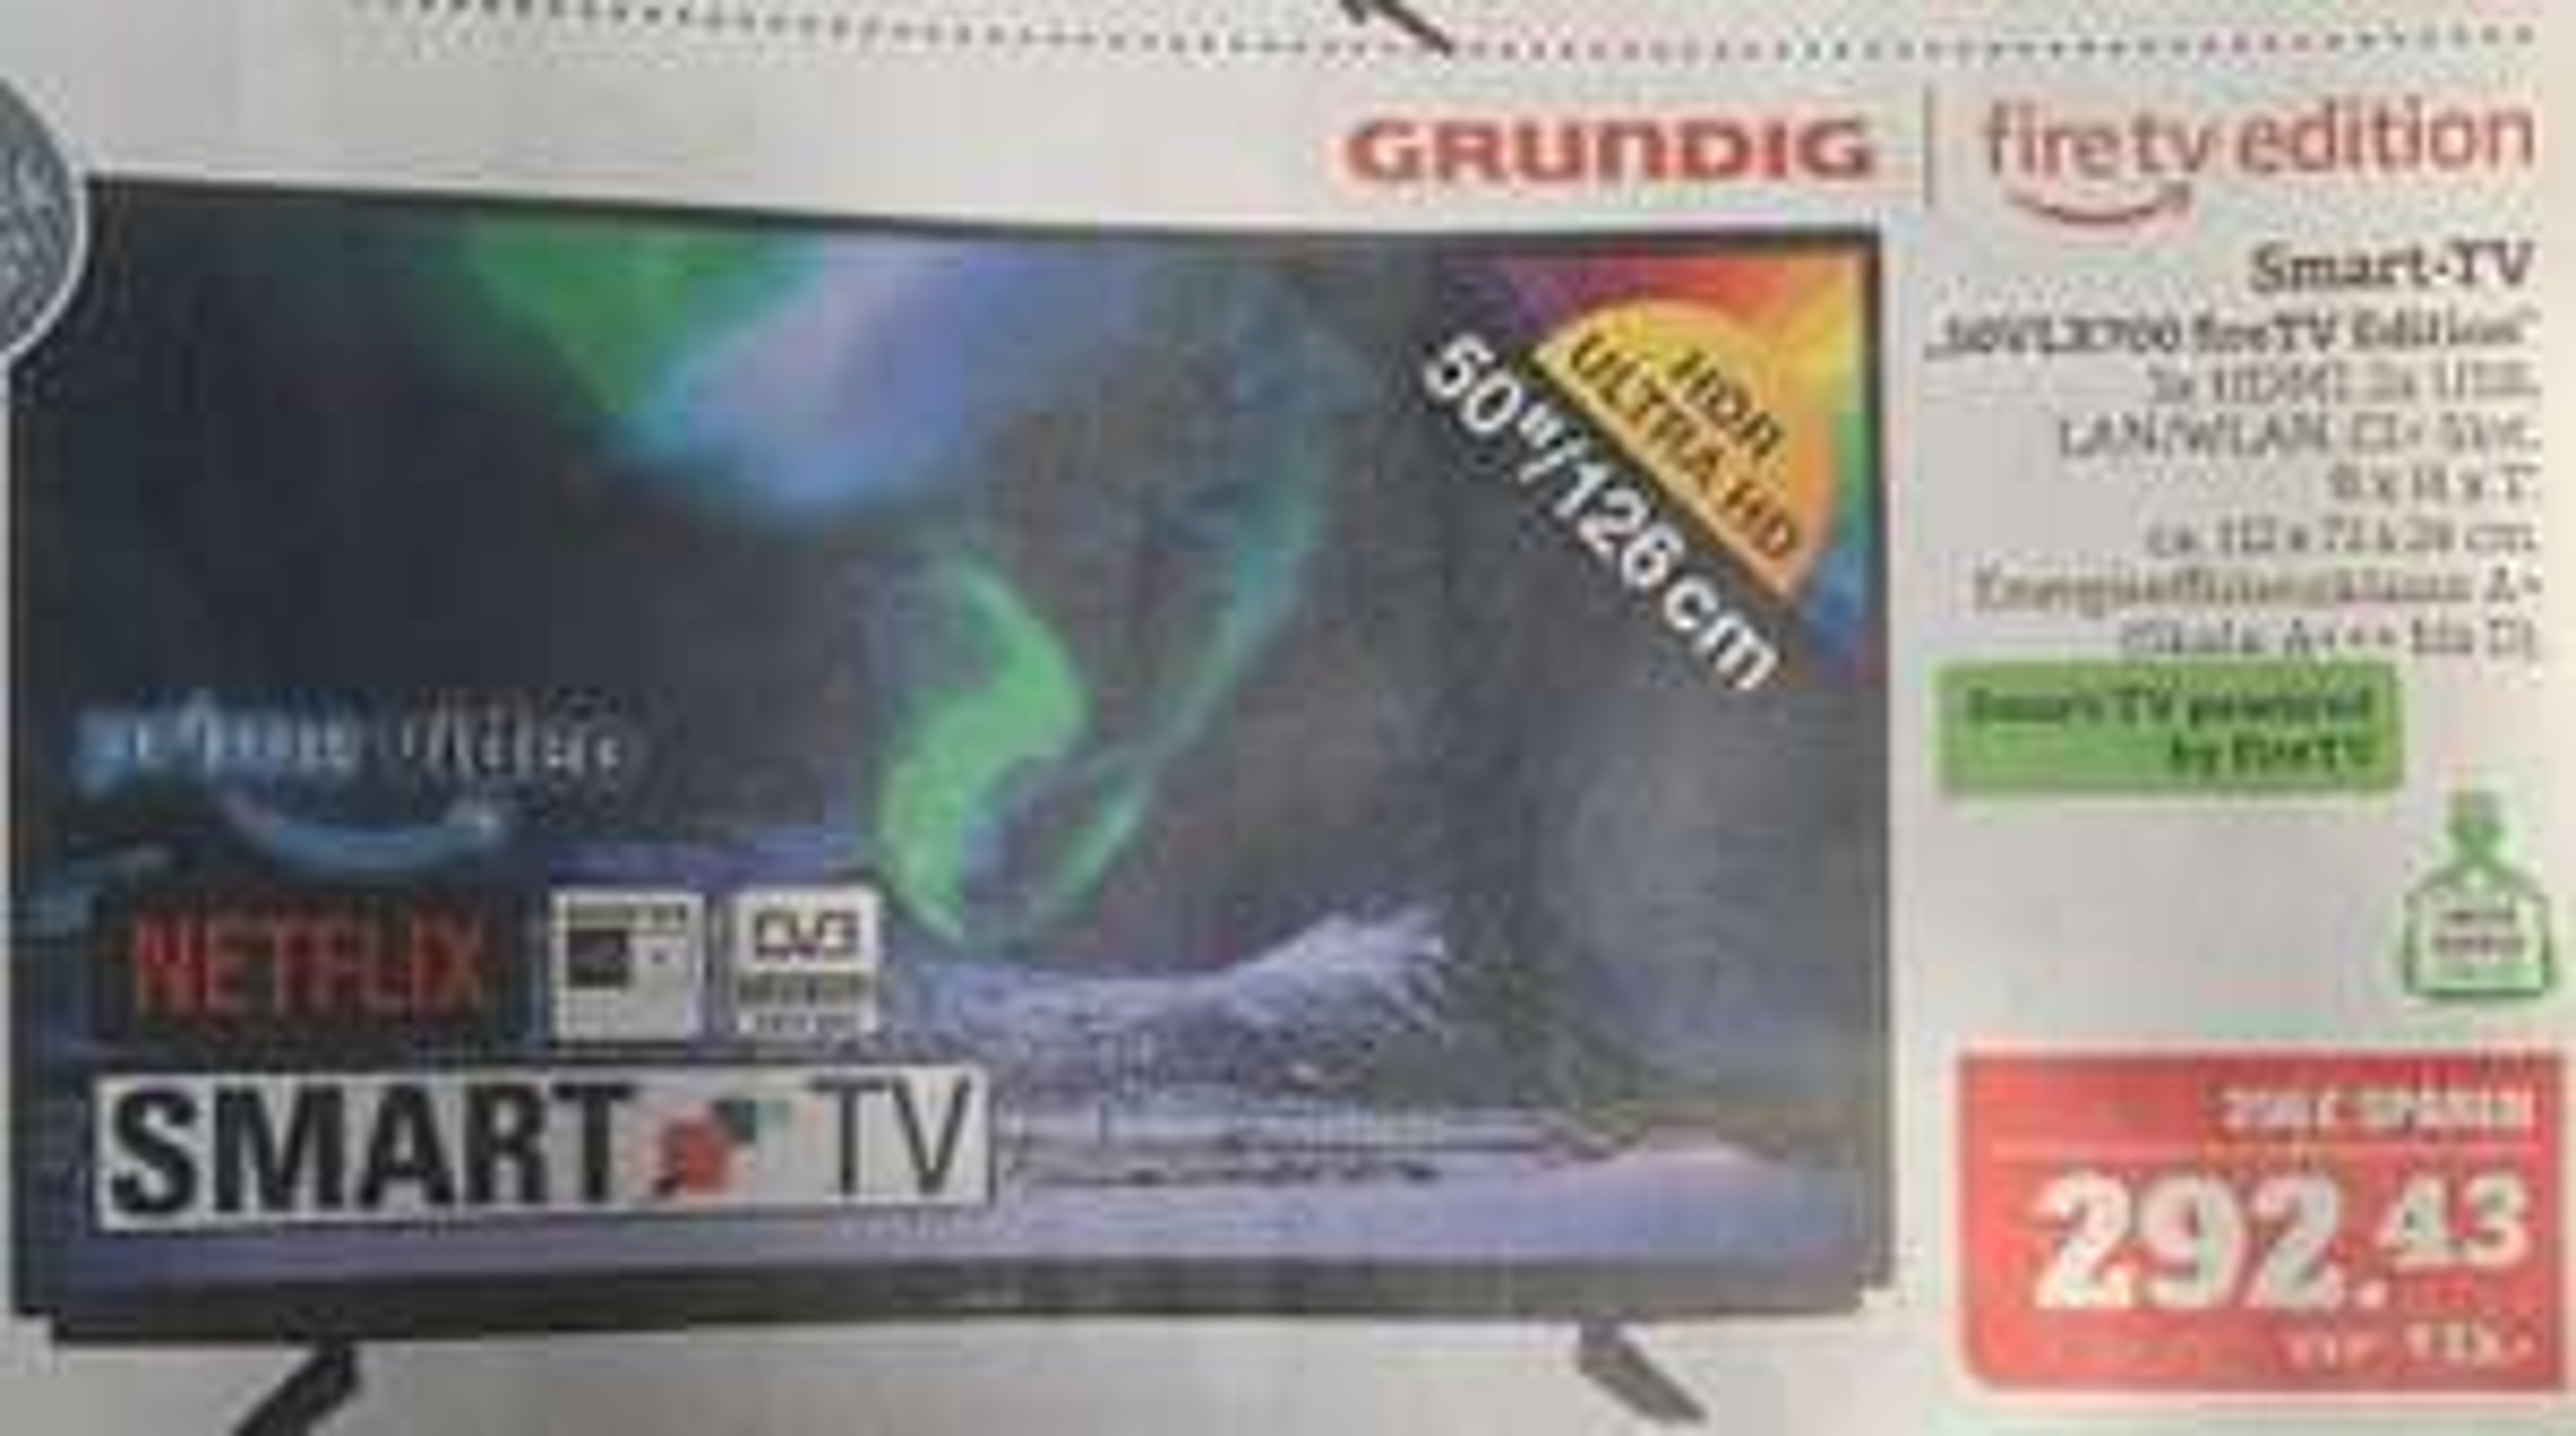 [Marktkauf] 50 Zoll UHD Grundig 50VLX700 Fire TV Edition